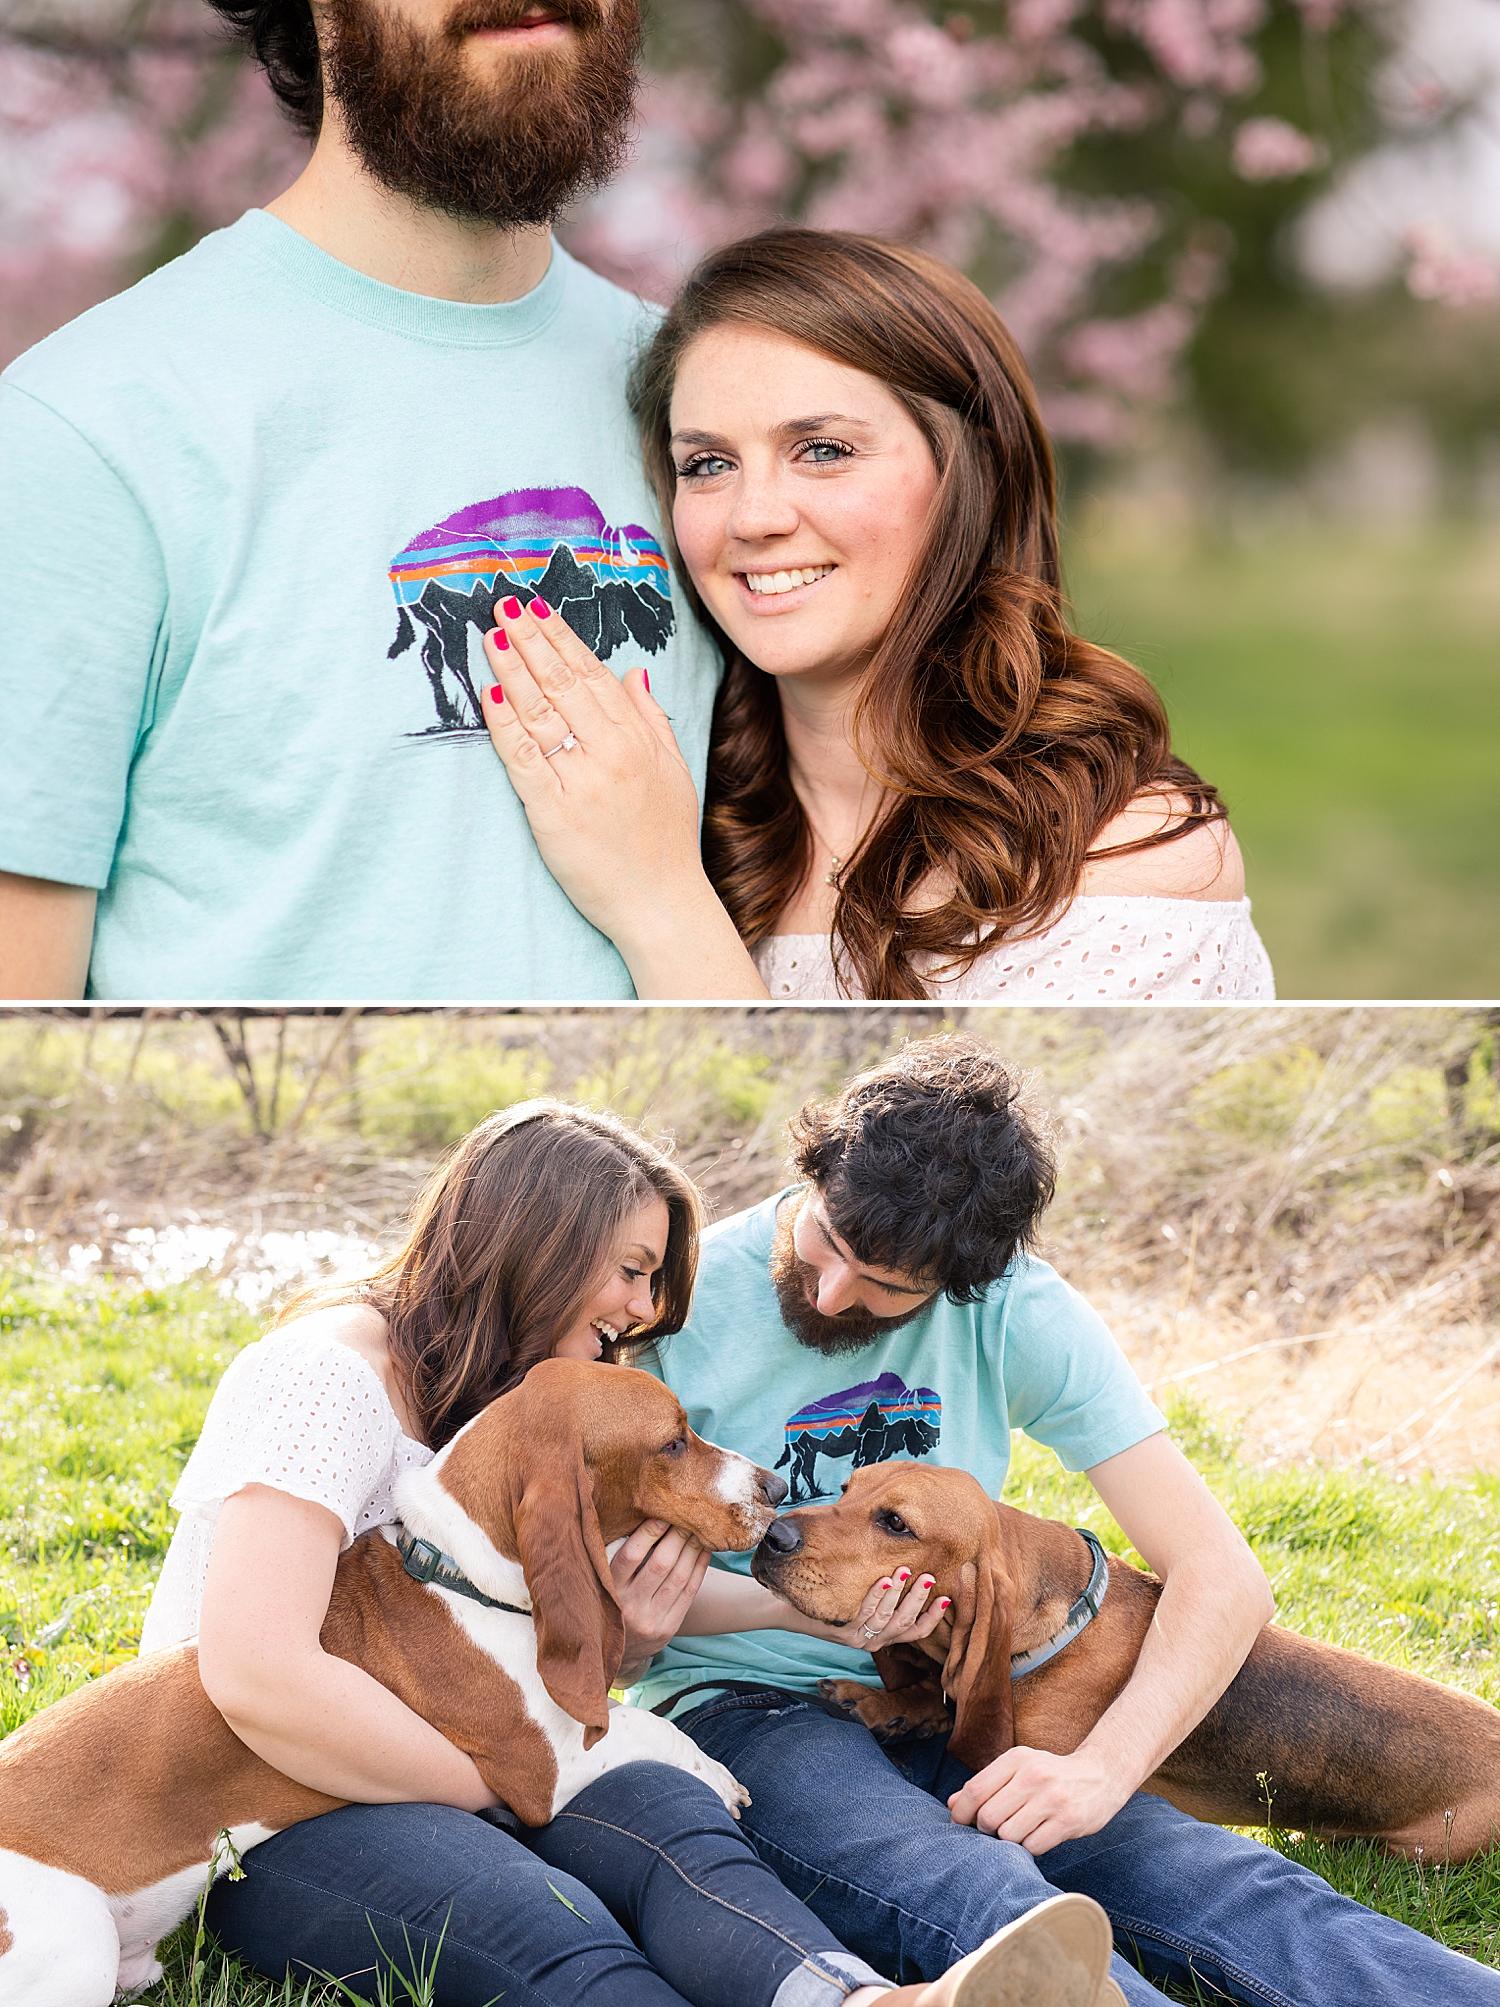 Matthew and Callie Roanoke Engagement Session Photo_0452.jpg